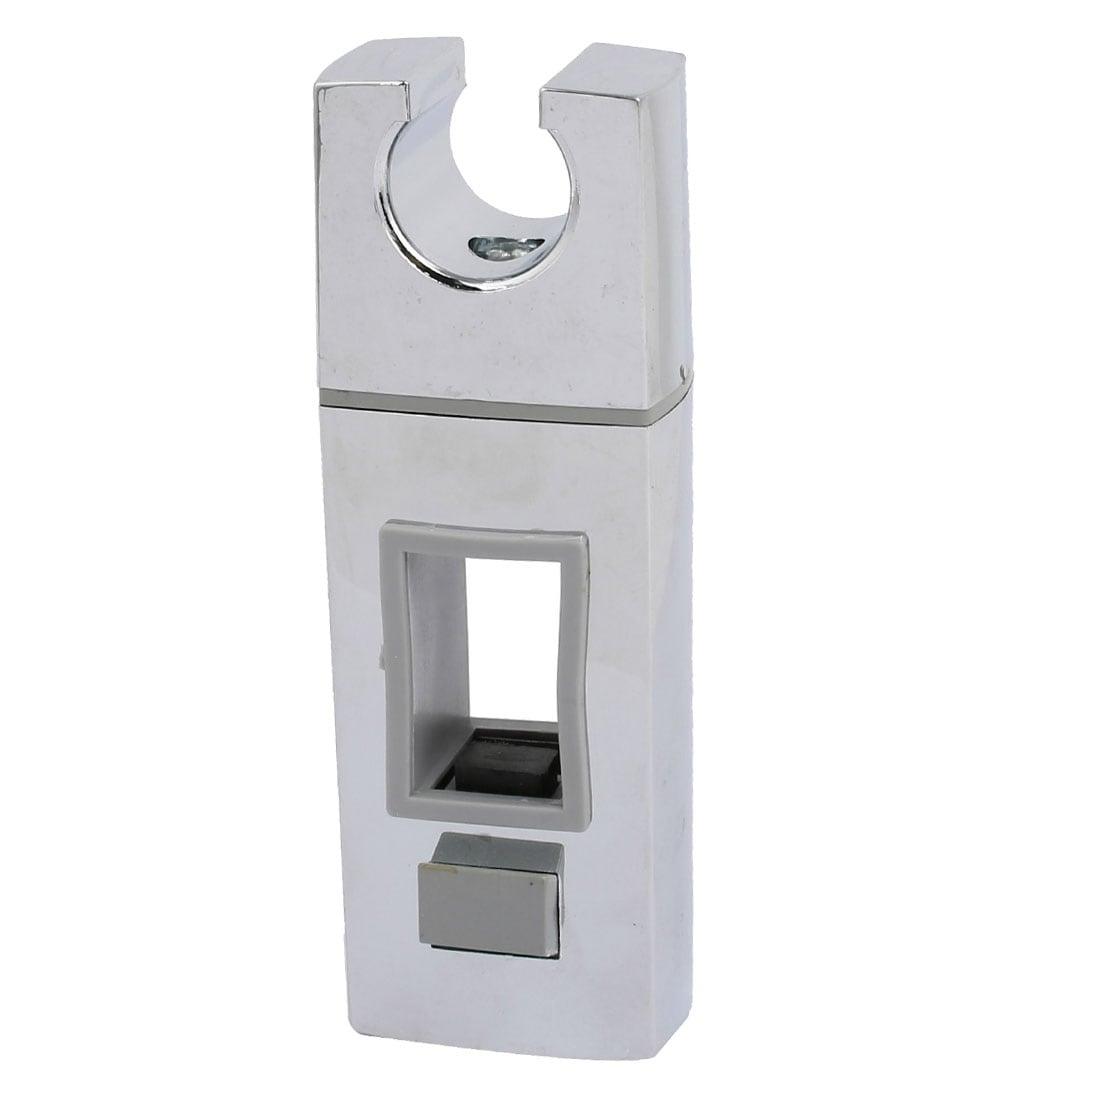 Bathroom Chrome Plated Handheld Shower Head Holder Bracket Silver Tone